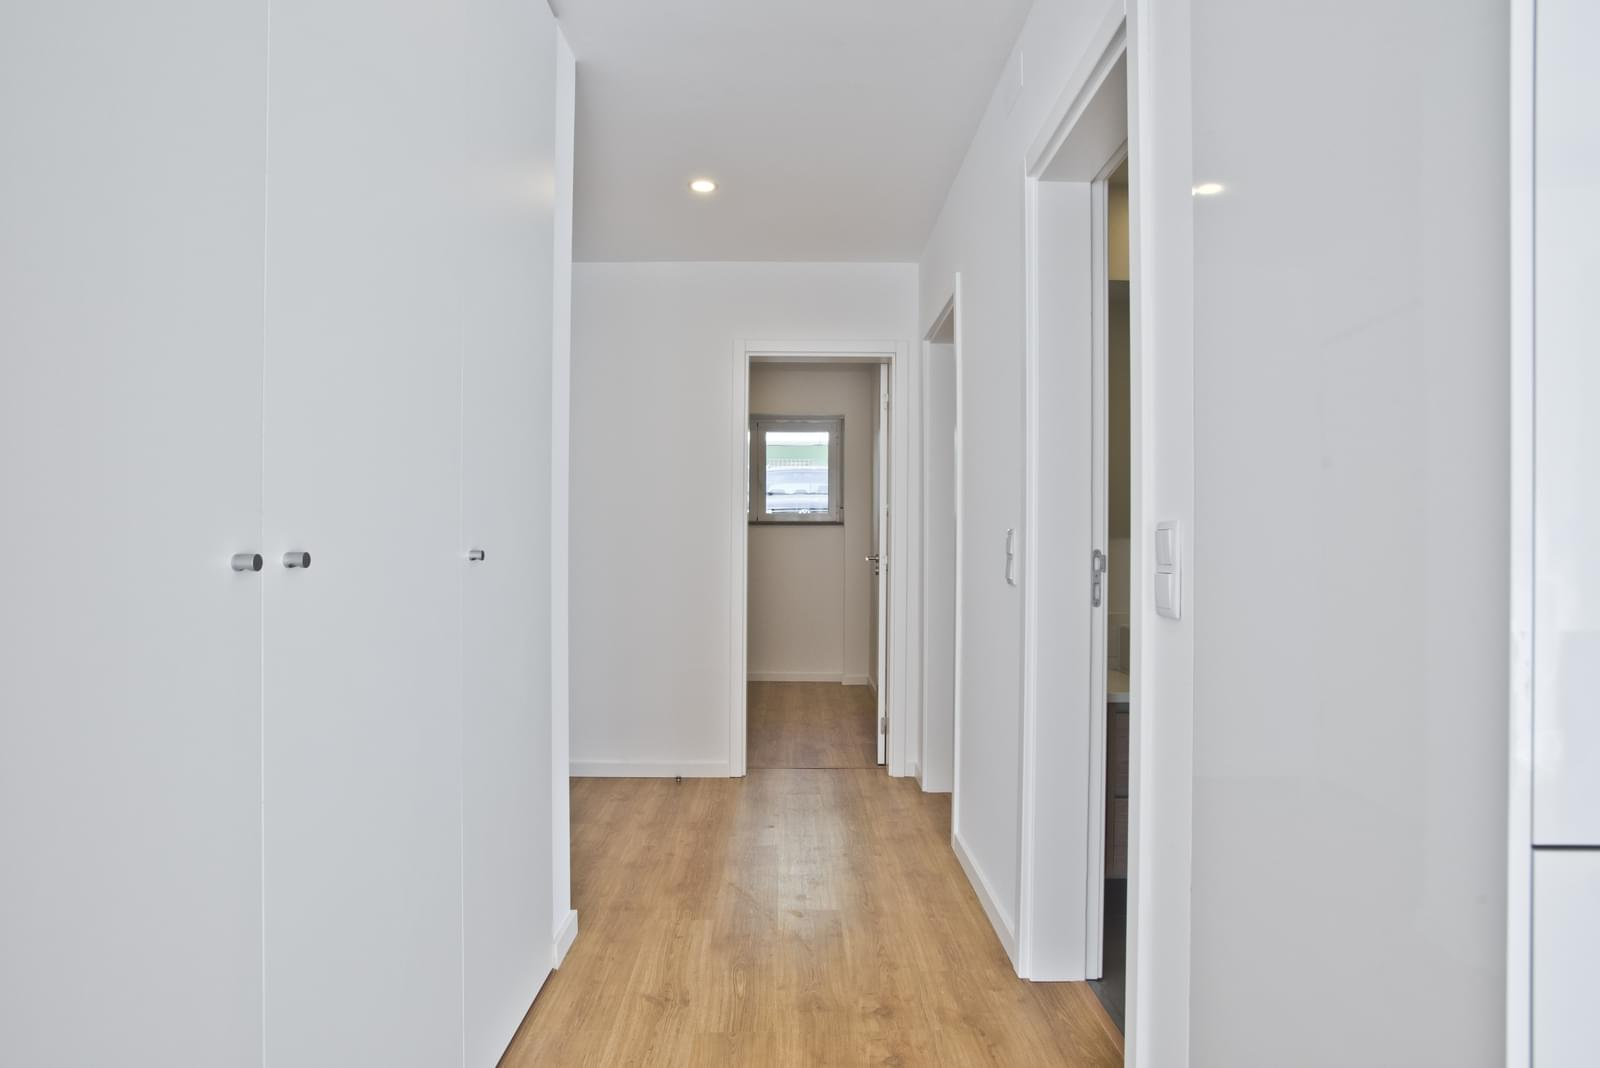 pf16986-apartamento-t2-cascais-a22362fb-d069-4591-a763-afb2acfb79dc